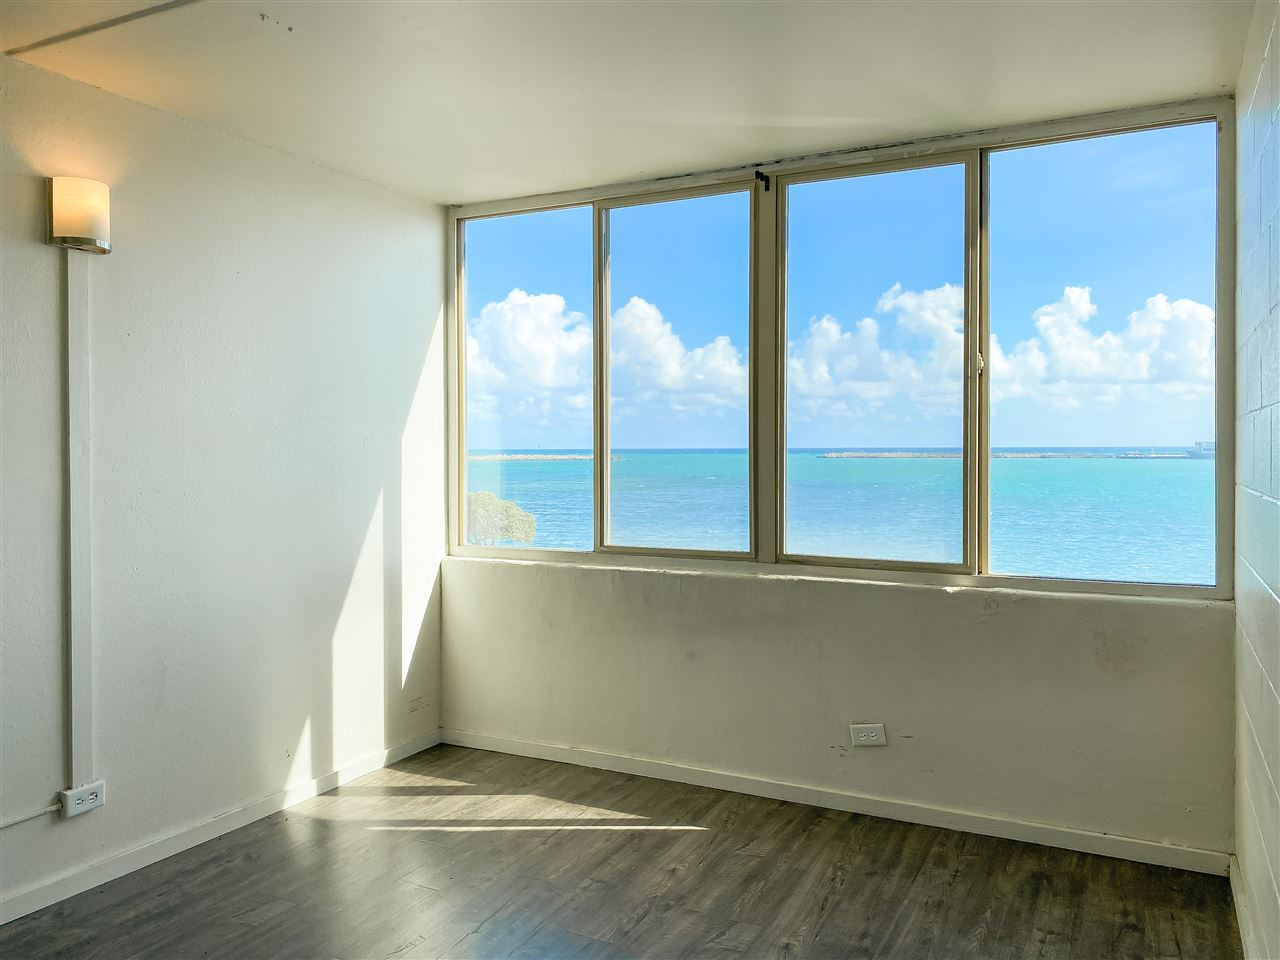 Photo of 111 KAHULUI BEACH Rd #A426, Kahului, HI 96732 (MLS # 387320)